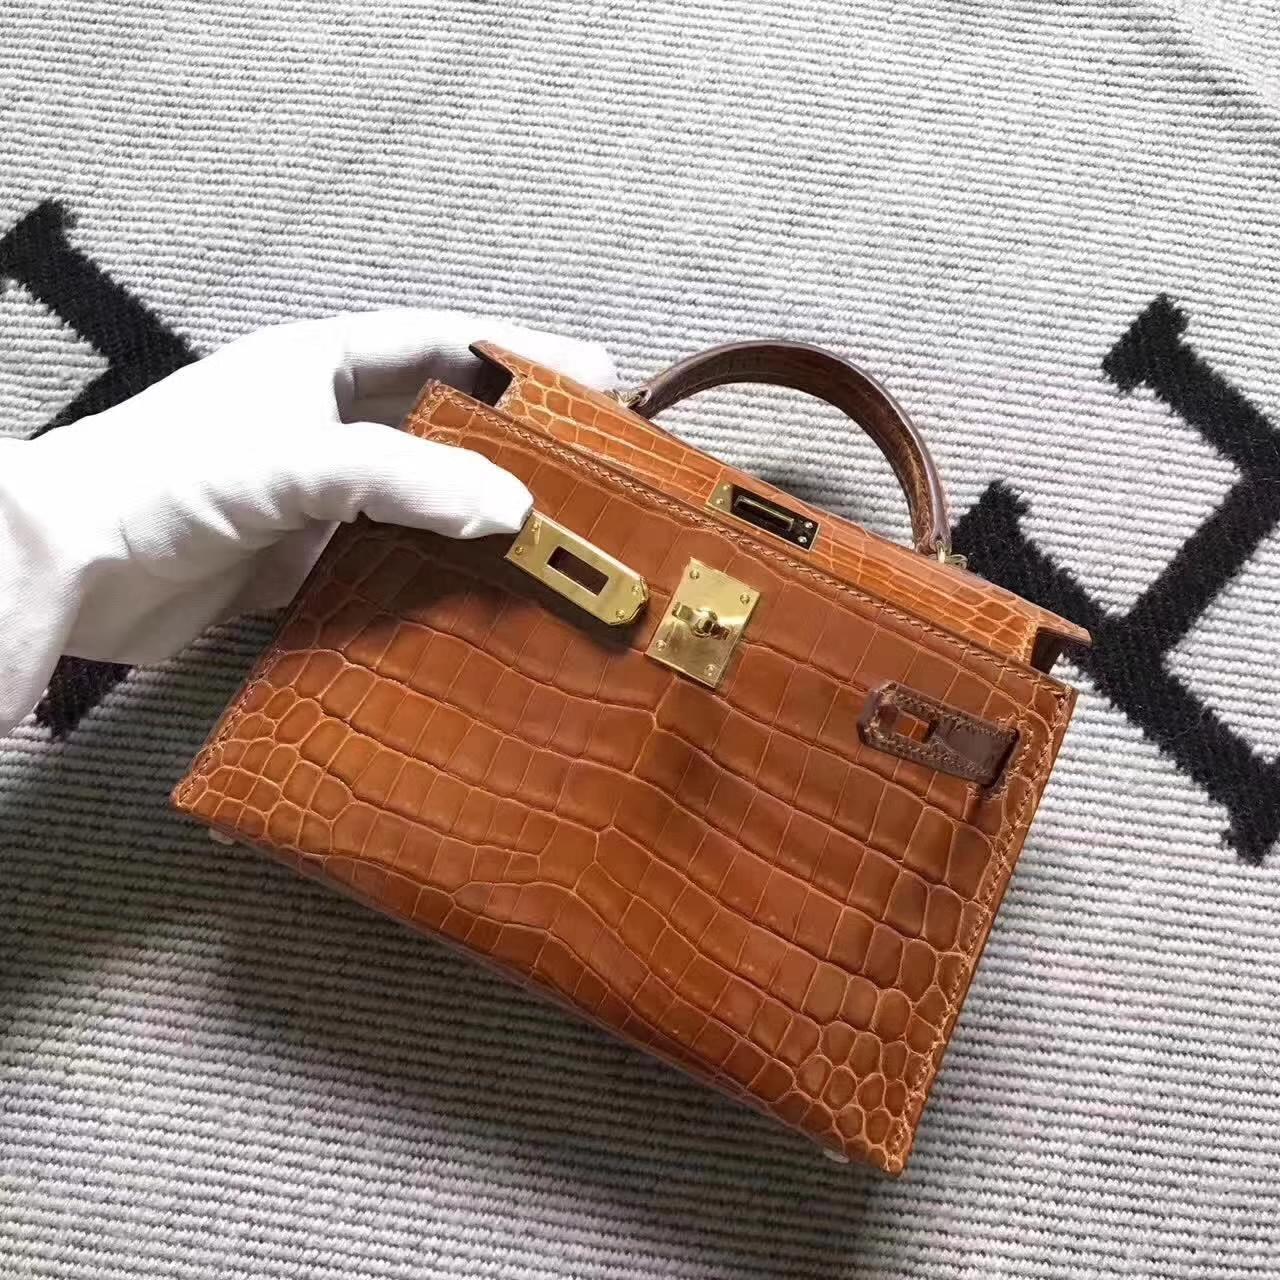 Fashion Hermes Amber Crocodile Shiny Leather Minikelly-2 Clutch Handbag